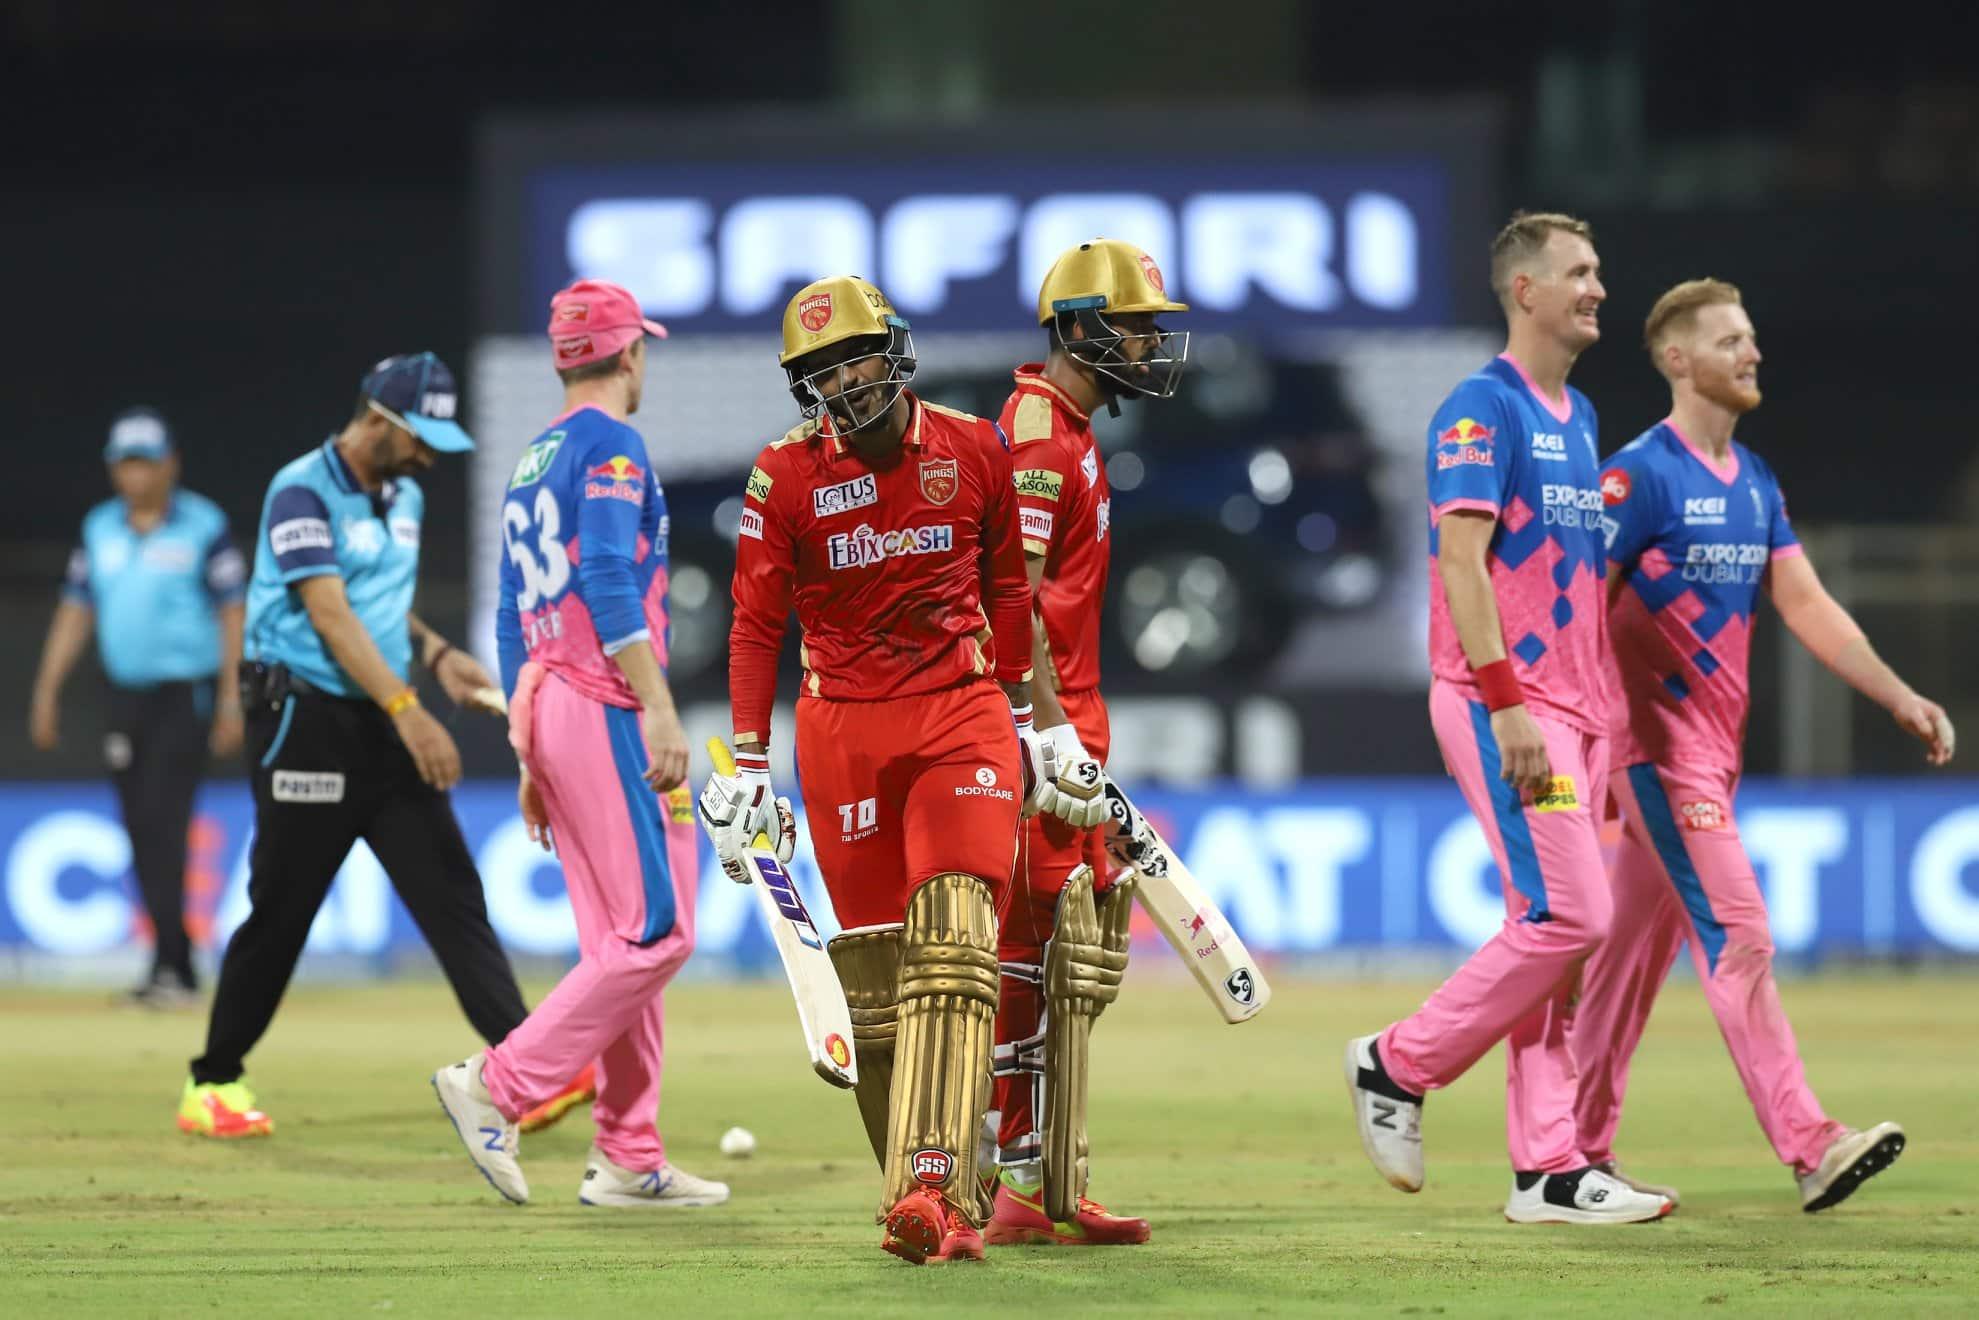 Punjab Kings batsman Deepak Hooda (centre) is disappointed after getting dismissed for 64 against Rajasthan Royals in their IPL 2021 tie. (Photo: IPL)